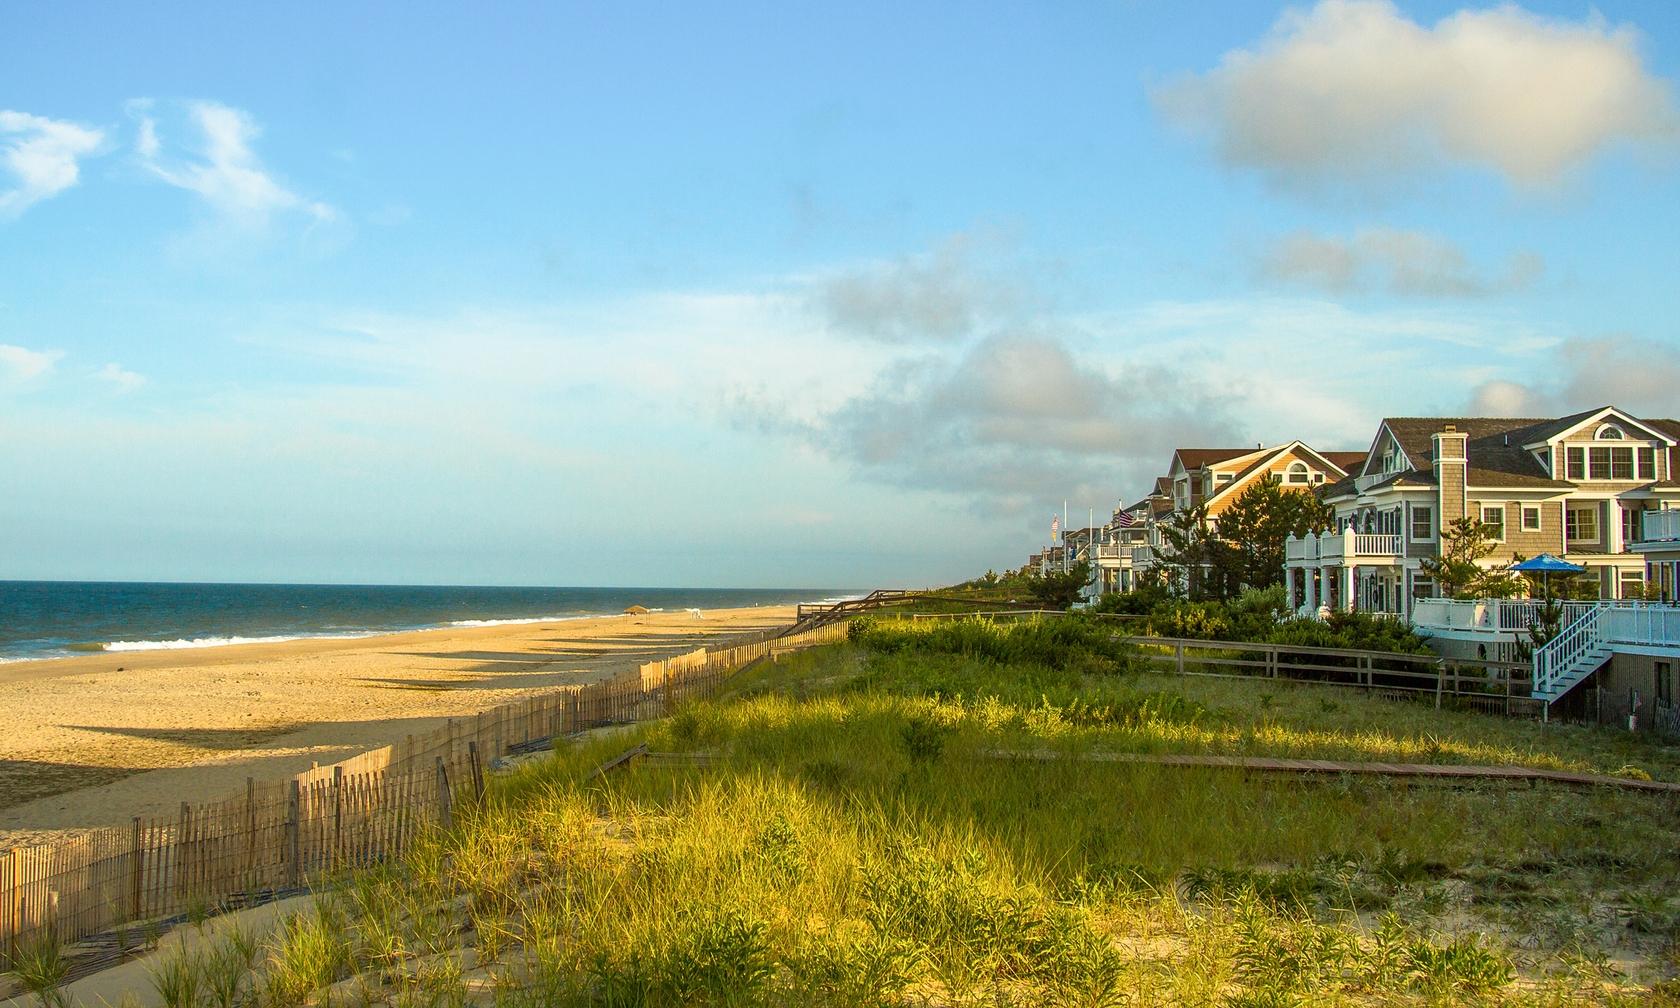 Vacation rentals in Bethany Beach